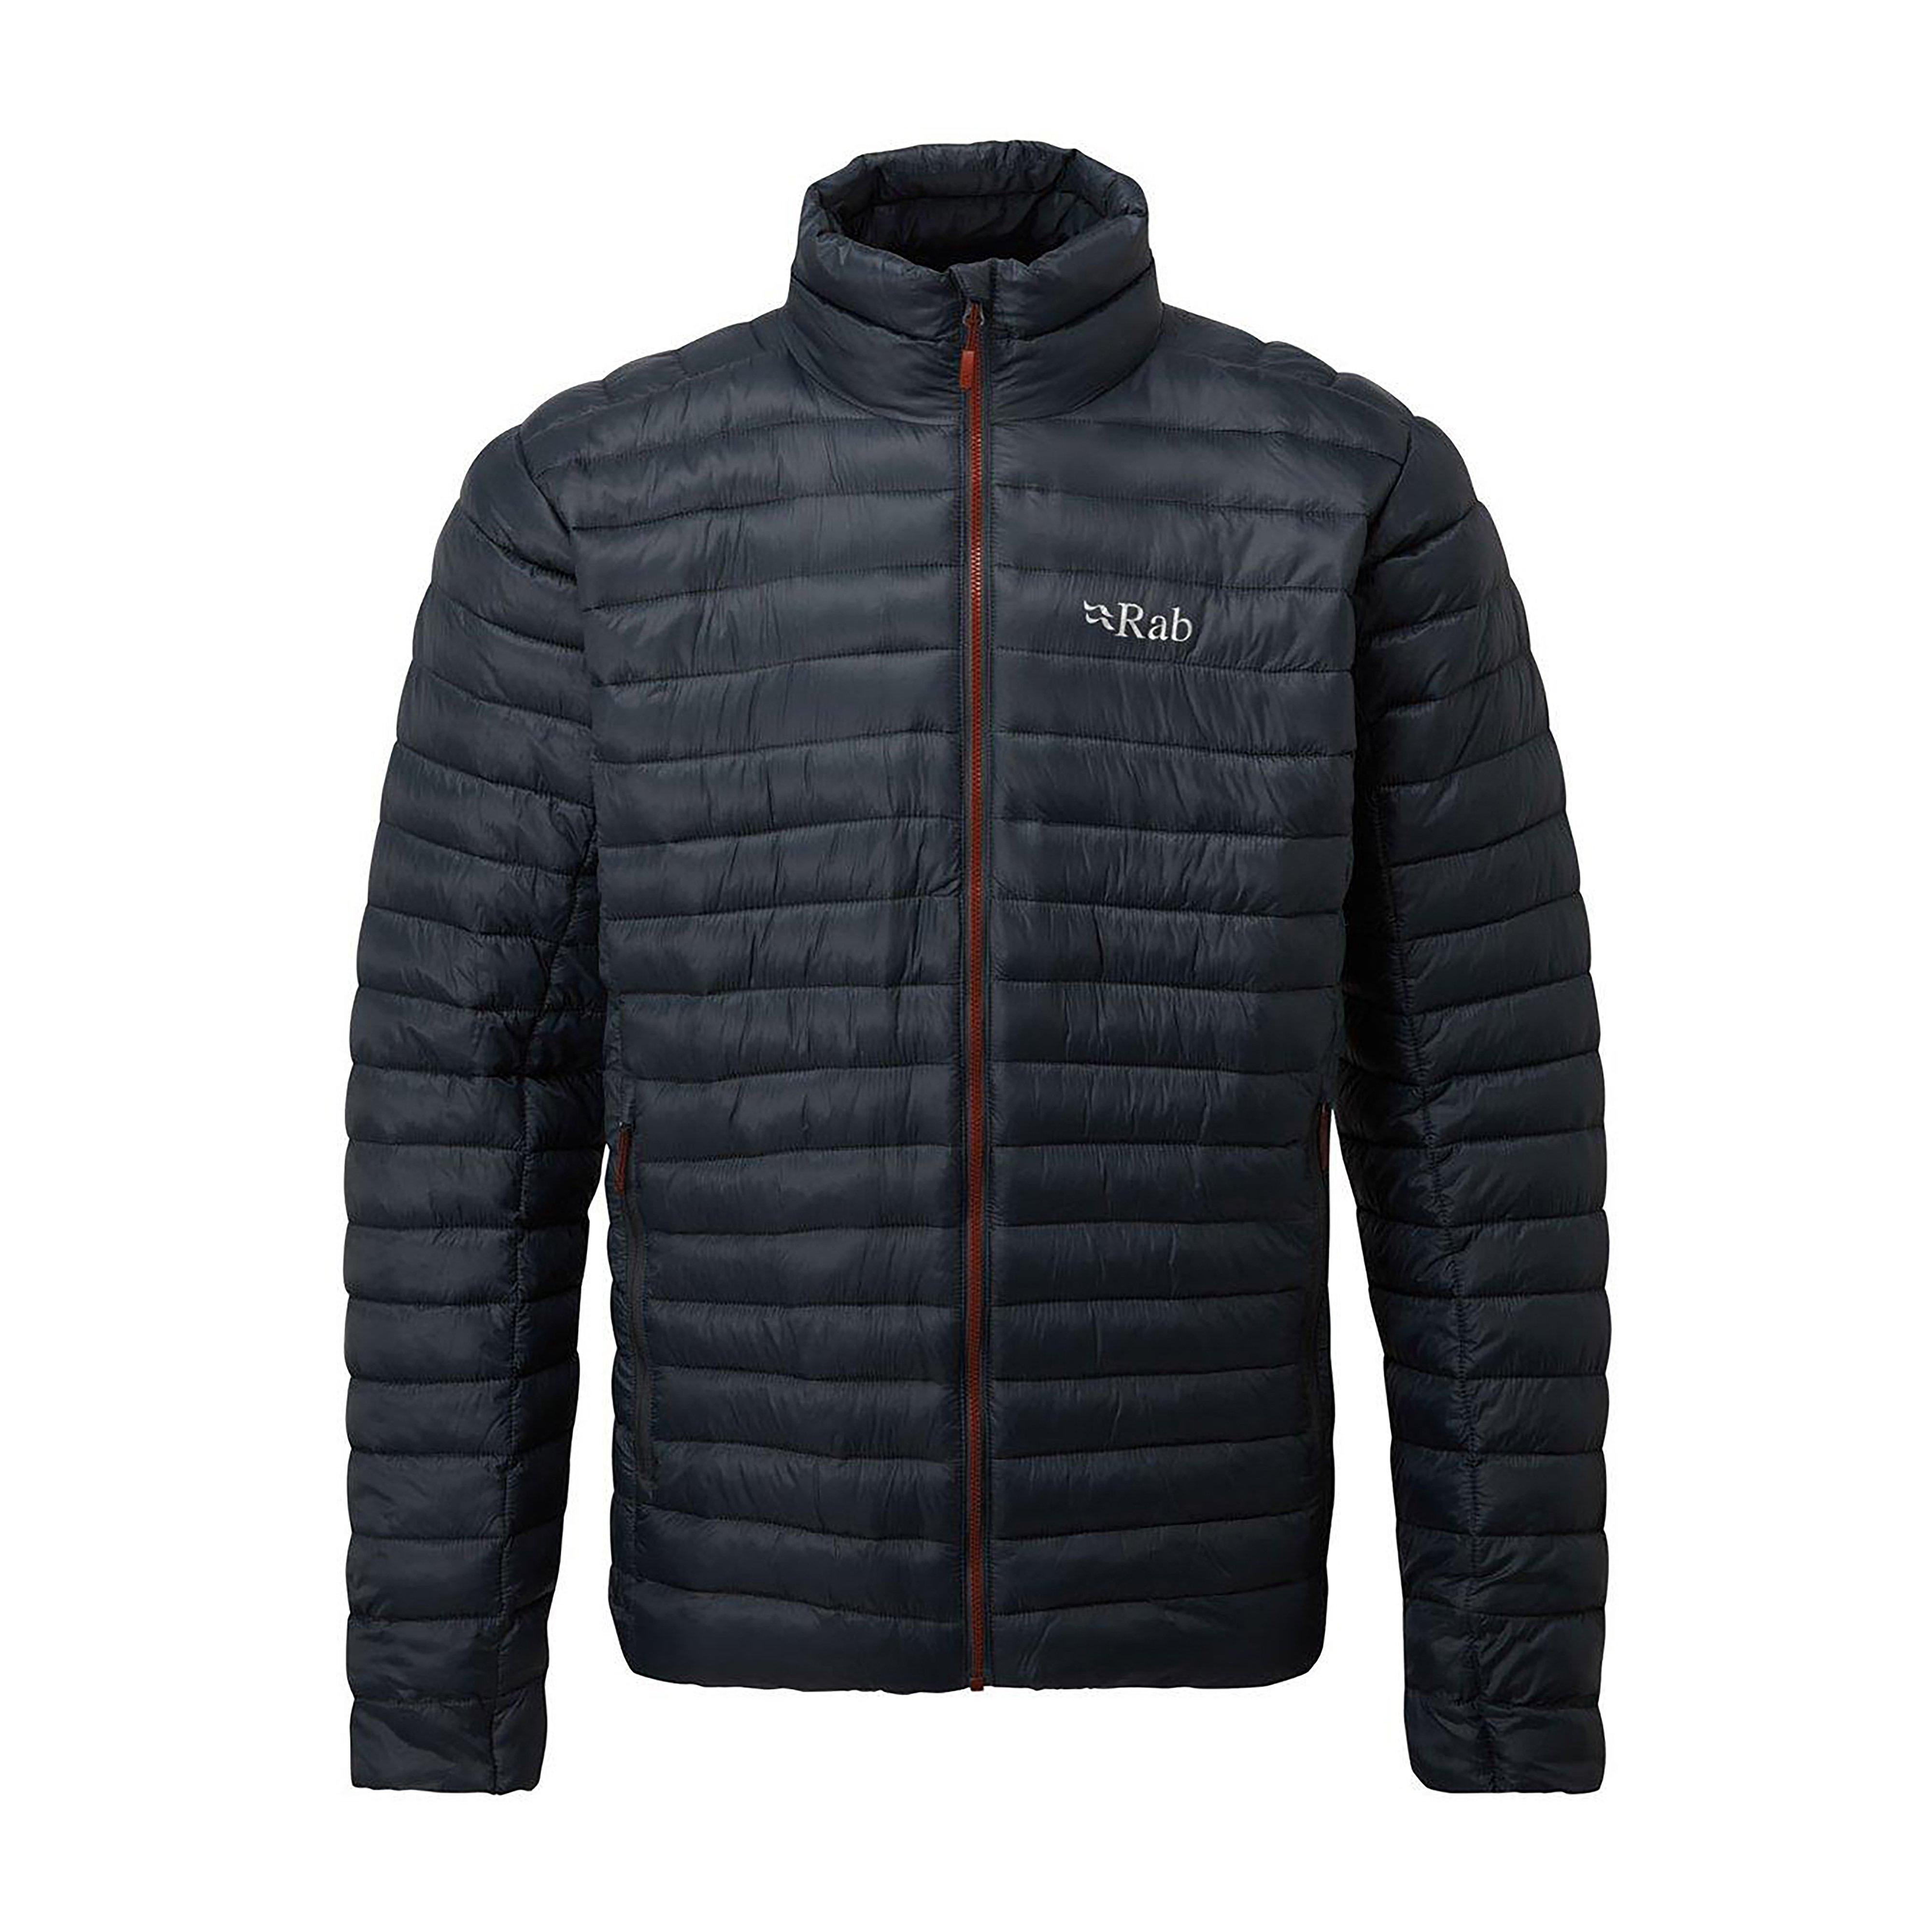 Rab Rab Mens Altus Insulated Jacket - N/A, N/A